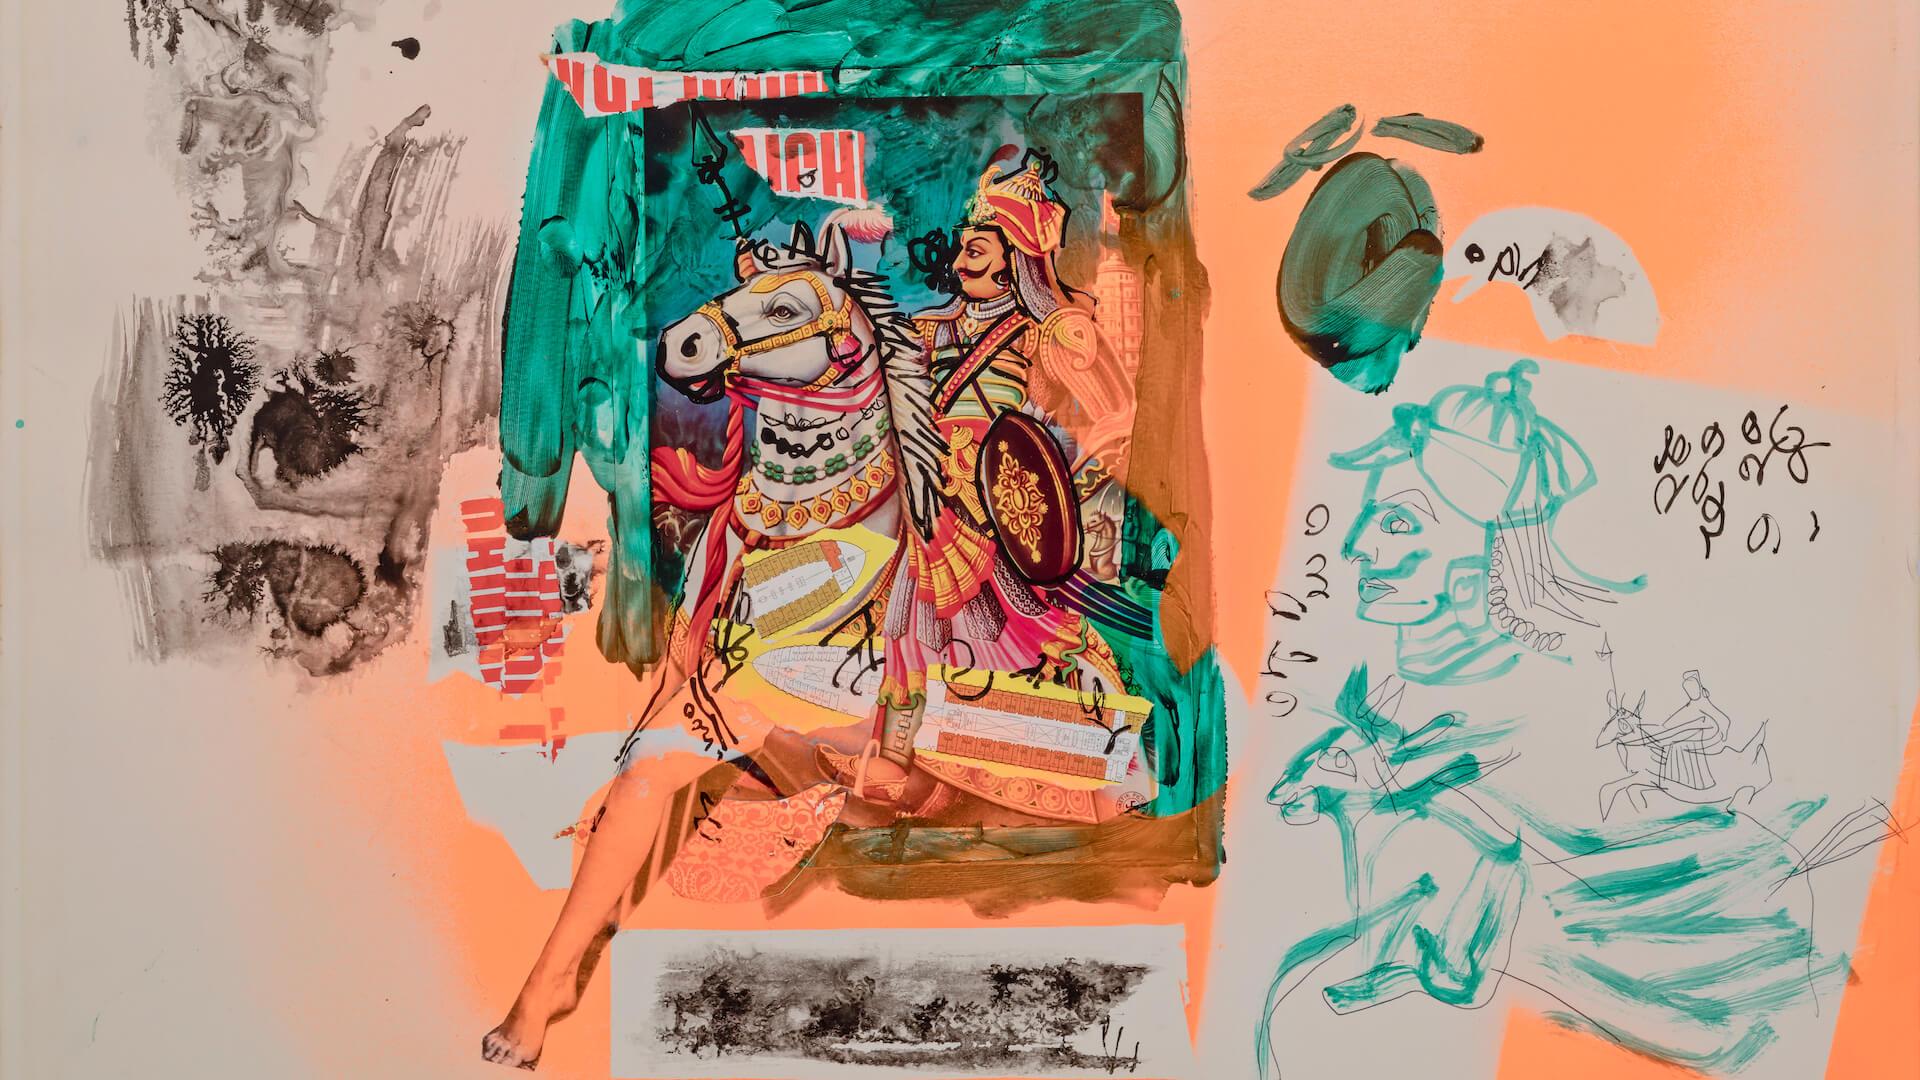 P. Manasaram - Artist Run Centre - Rungh Magazine - Volume 6, Number 2